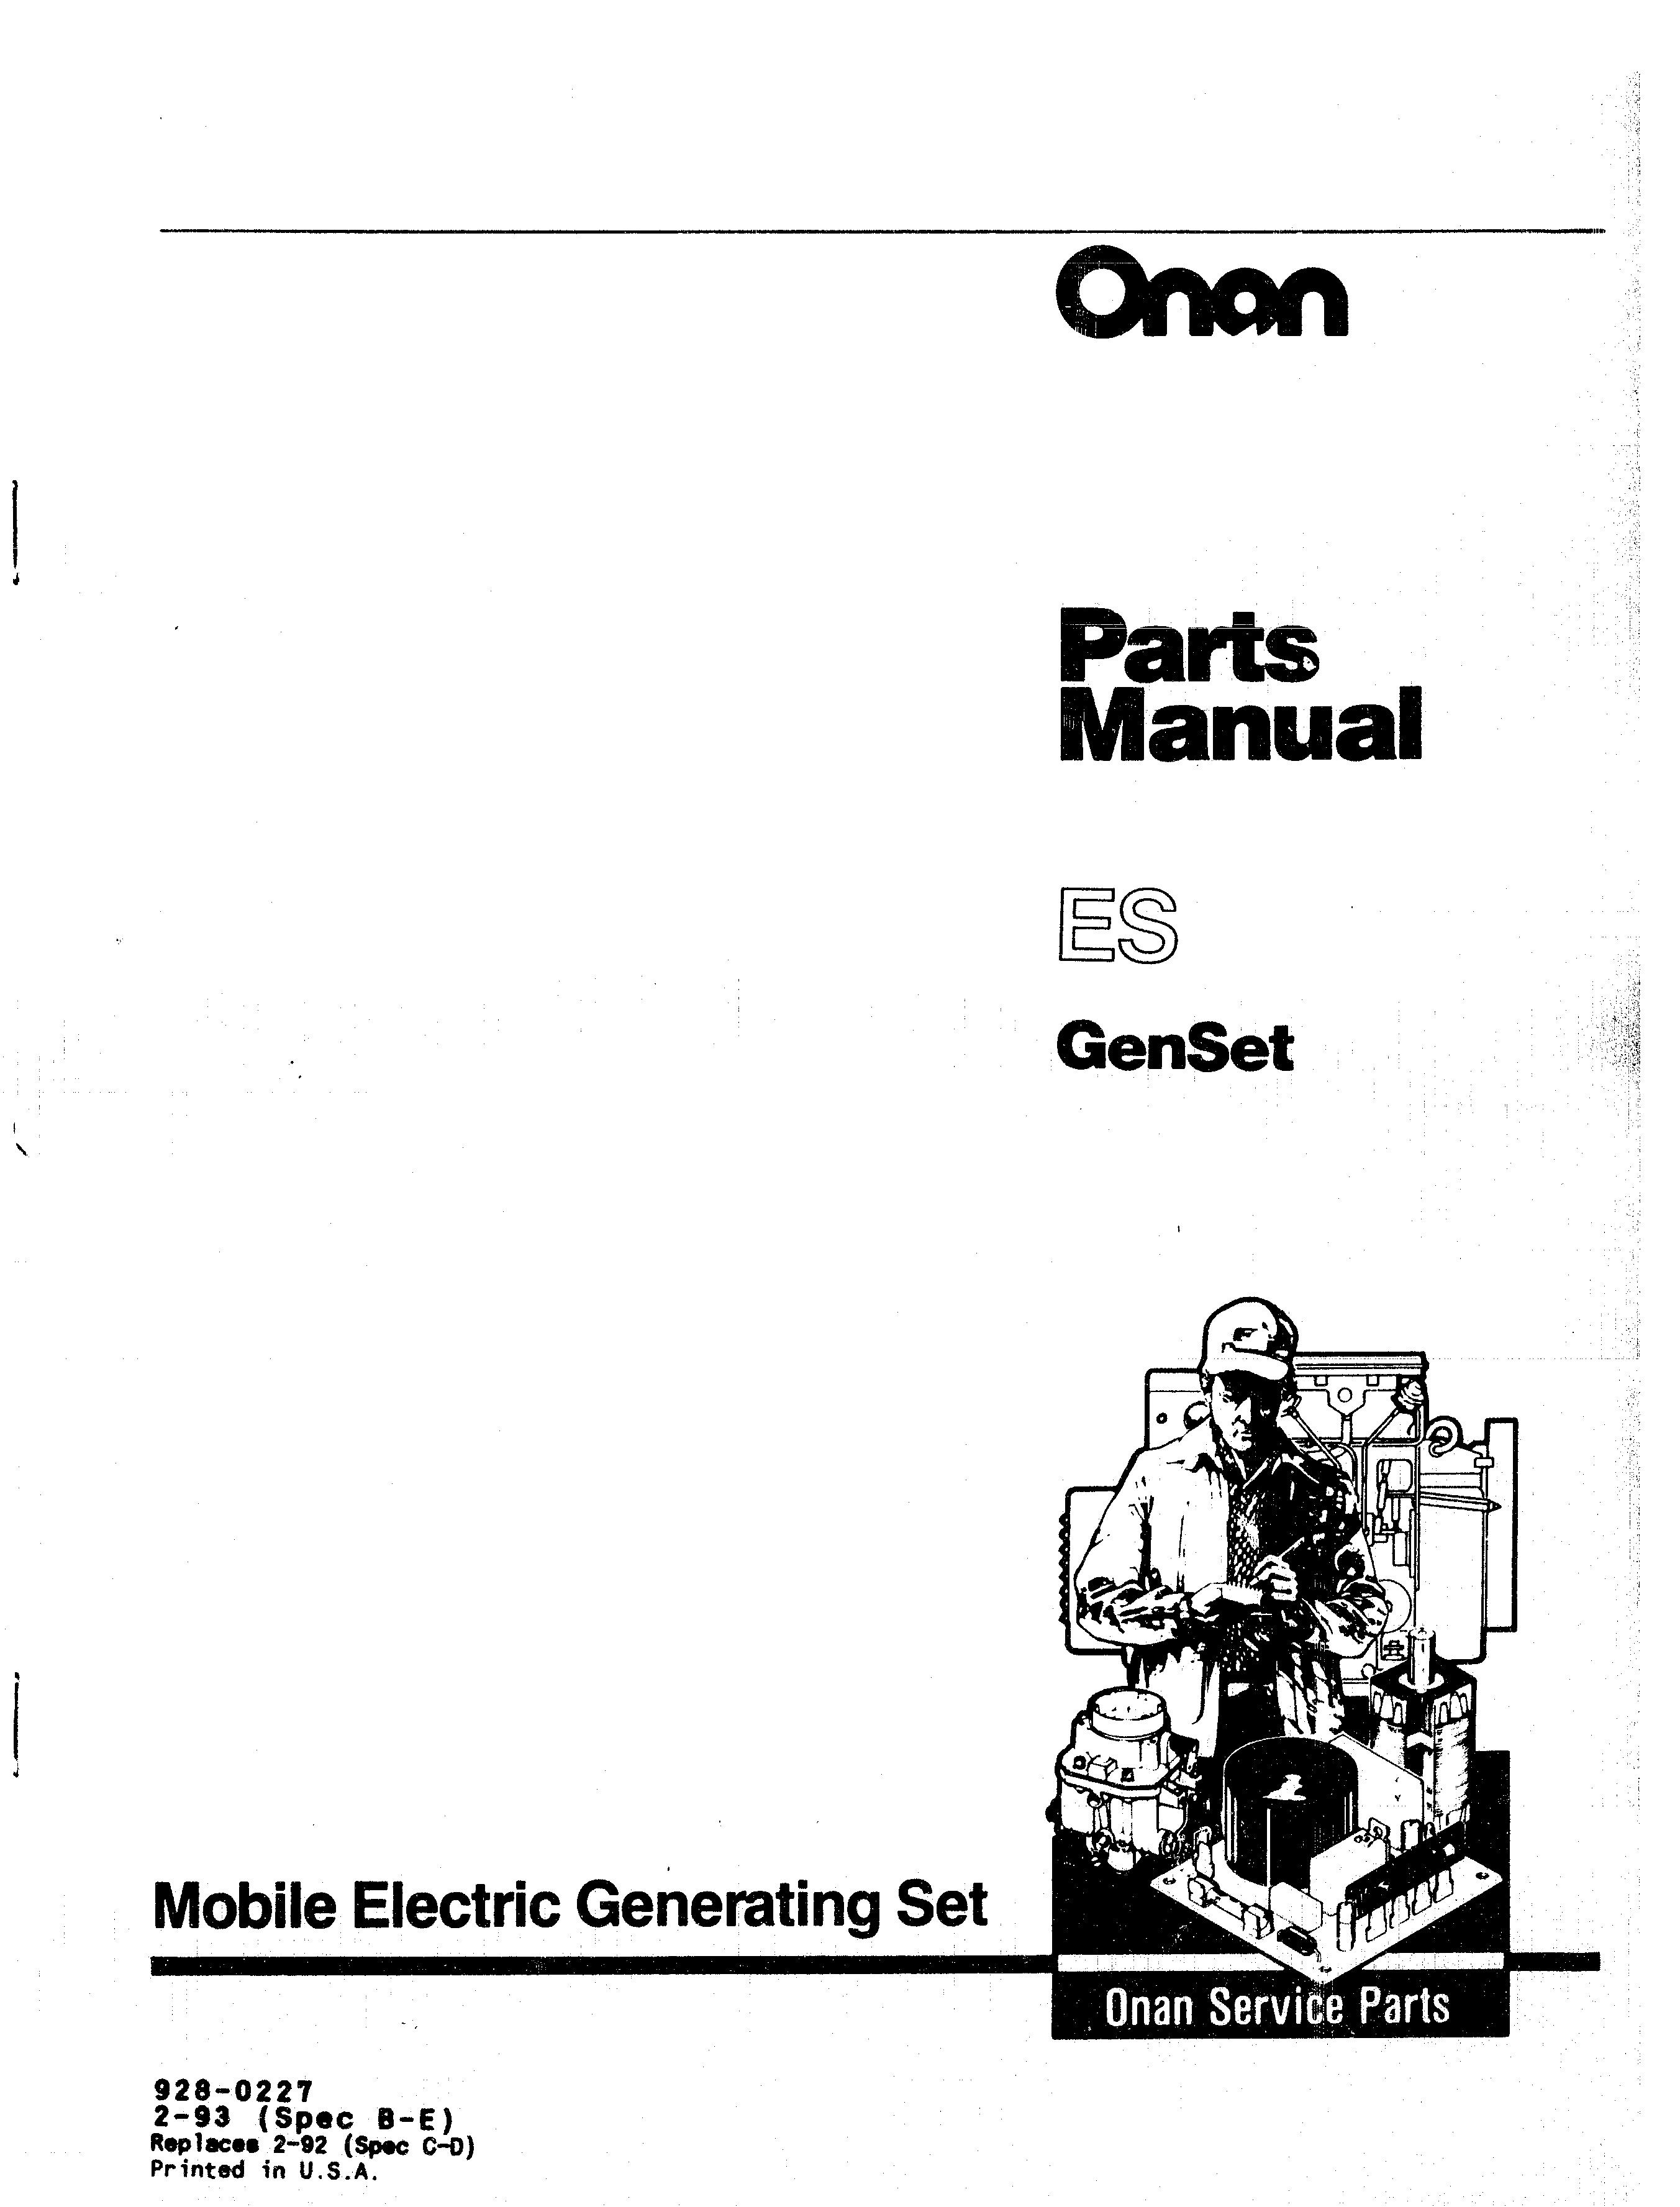 Onan Parts Manual - Owner Manual & Wiring Diagram